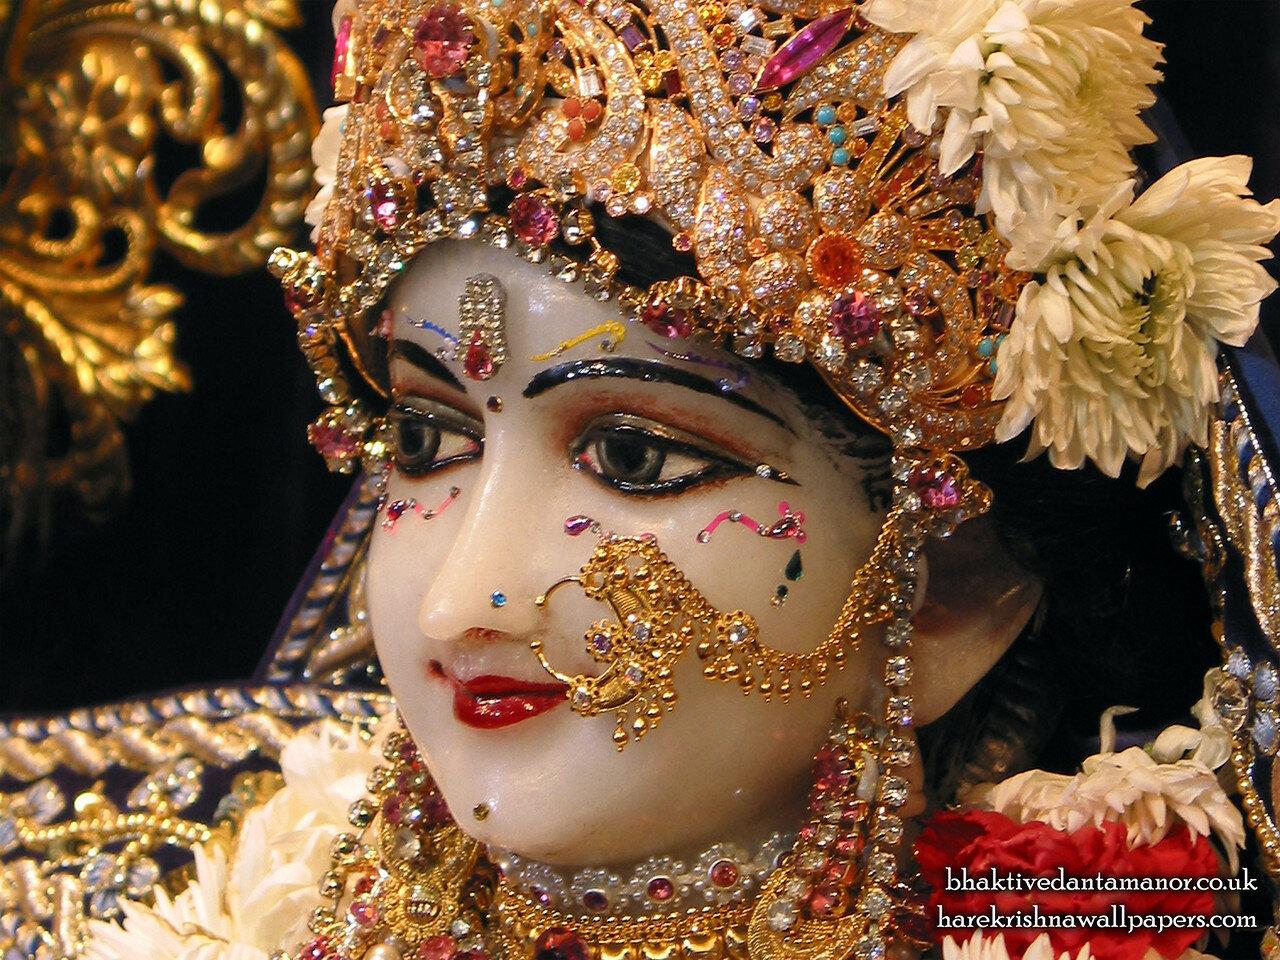 ��� �����, ���� ������ ������������� �����, ������ (Sri Radha)